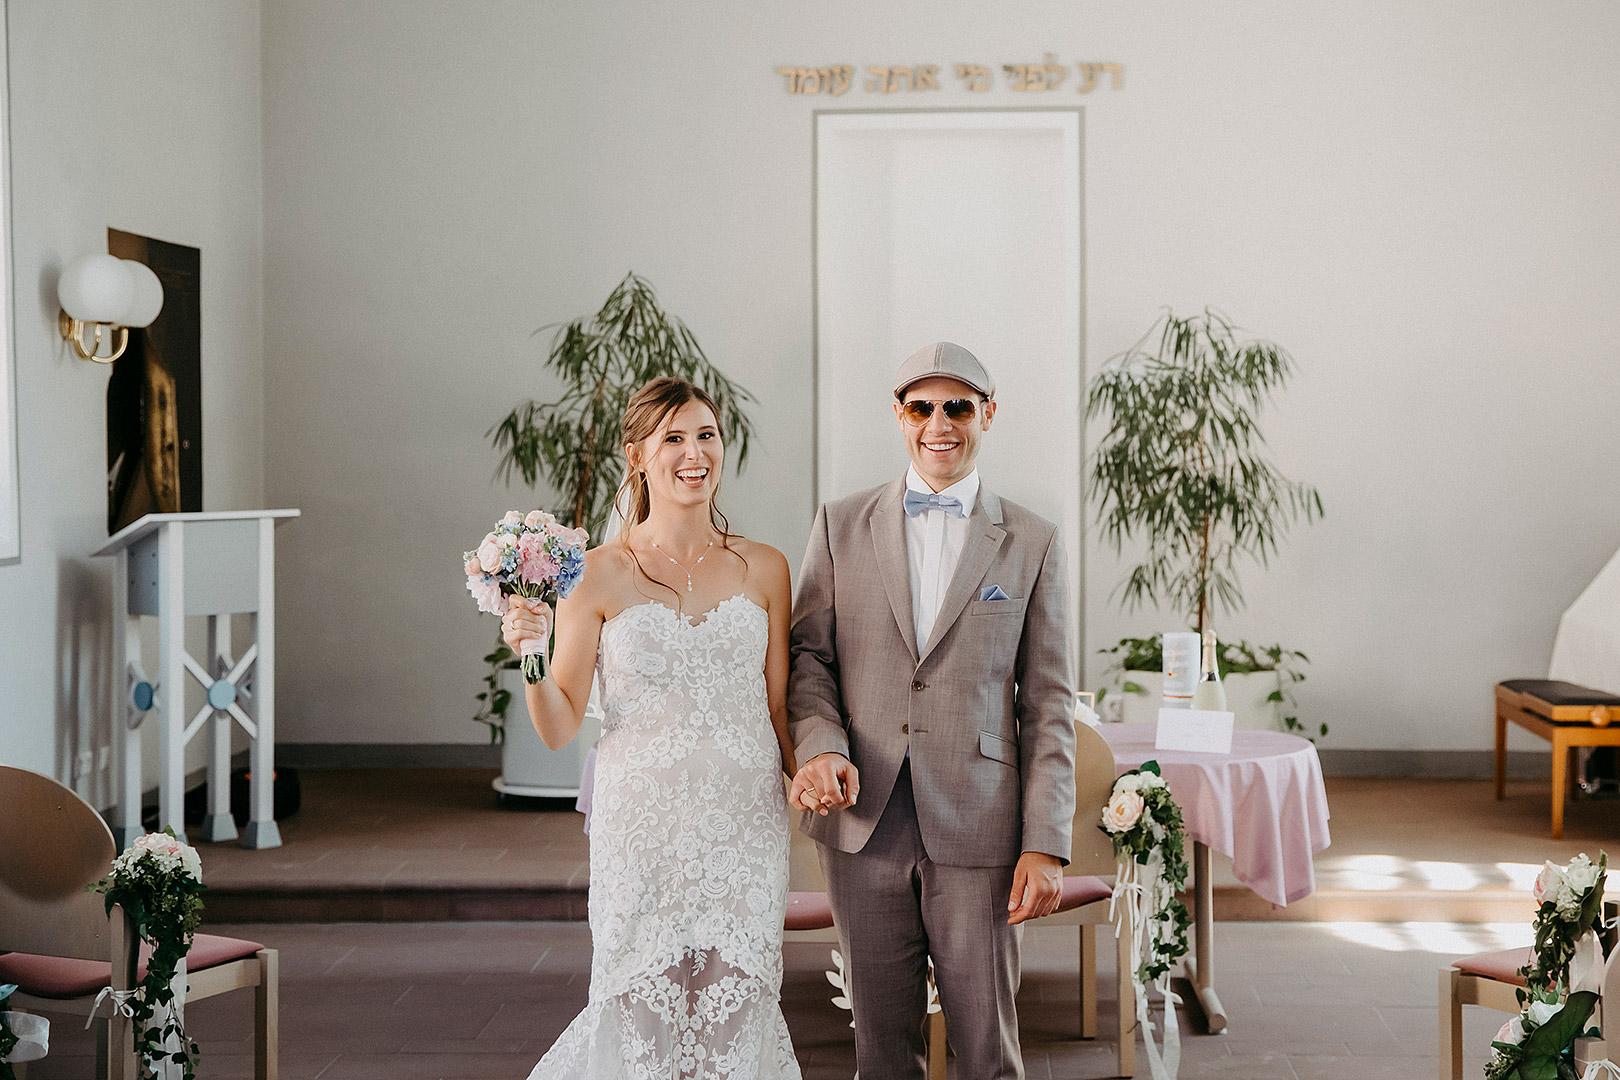 portrait_wedding_annkathrinundandreas_45